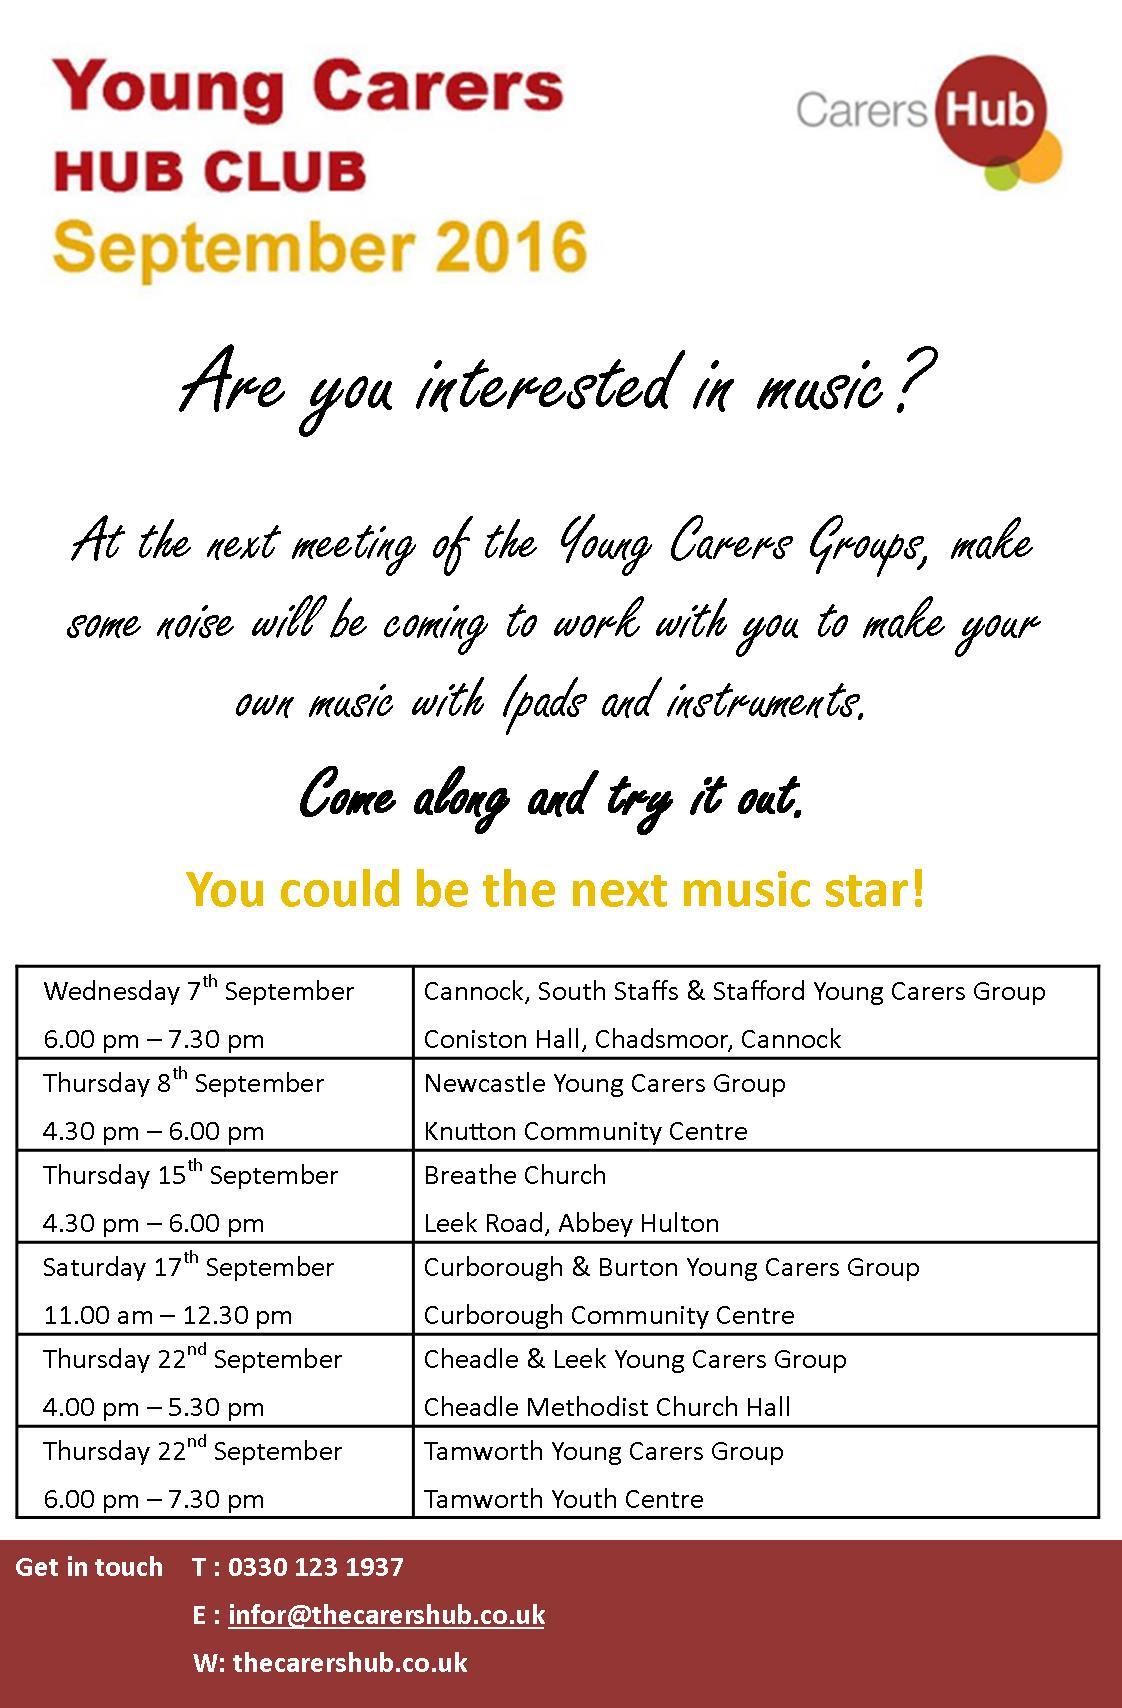 Young Carers Hub Club